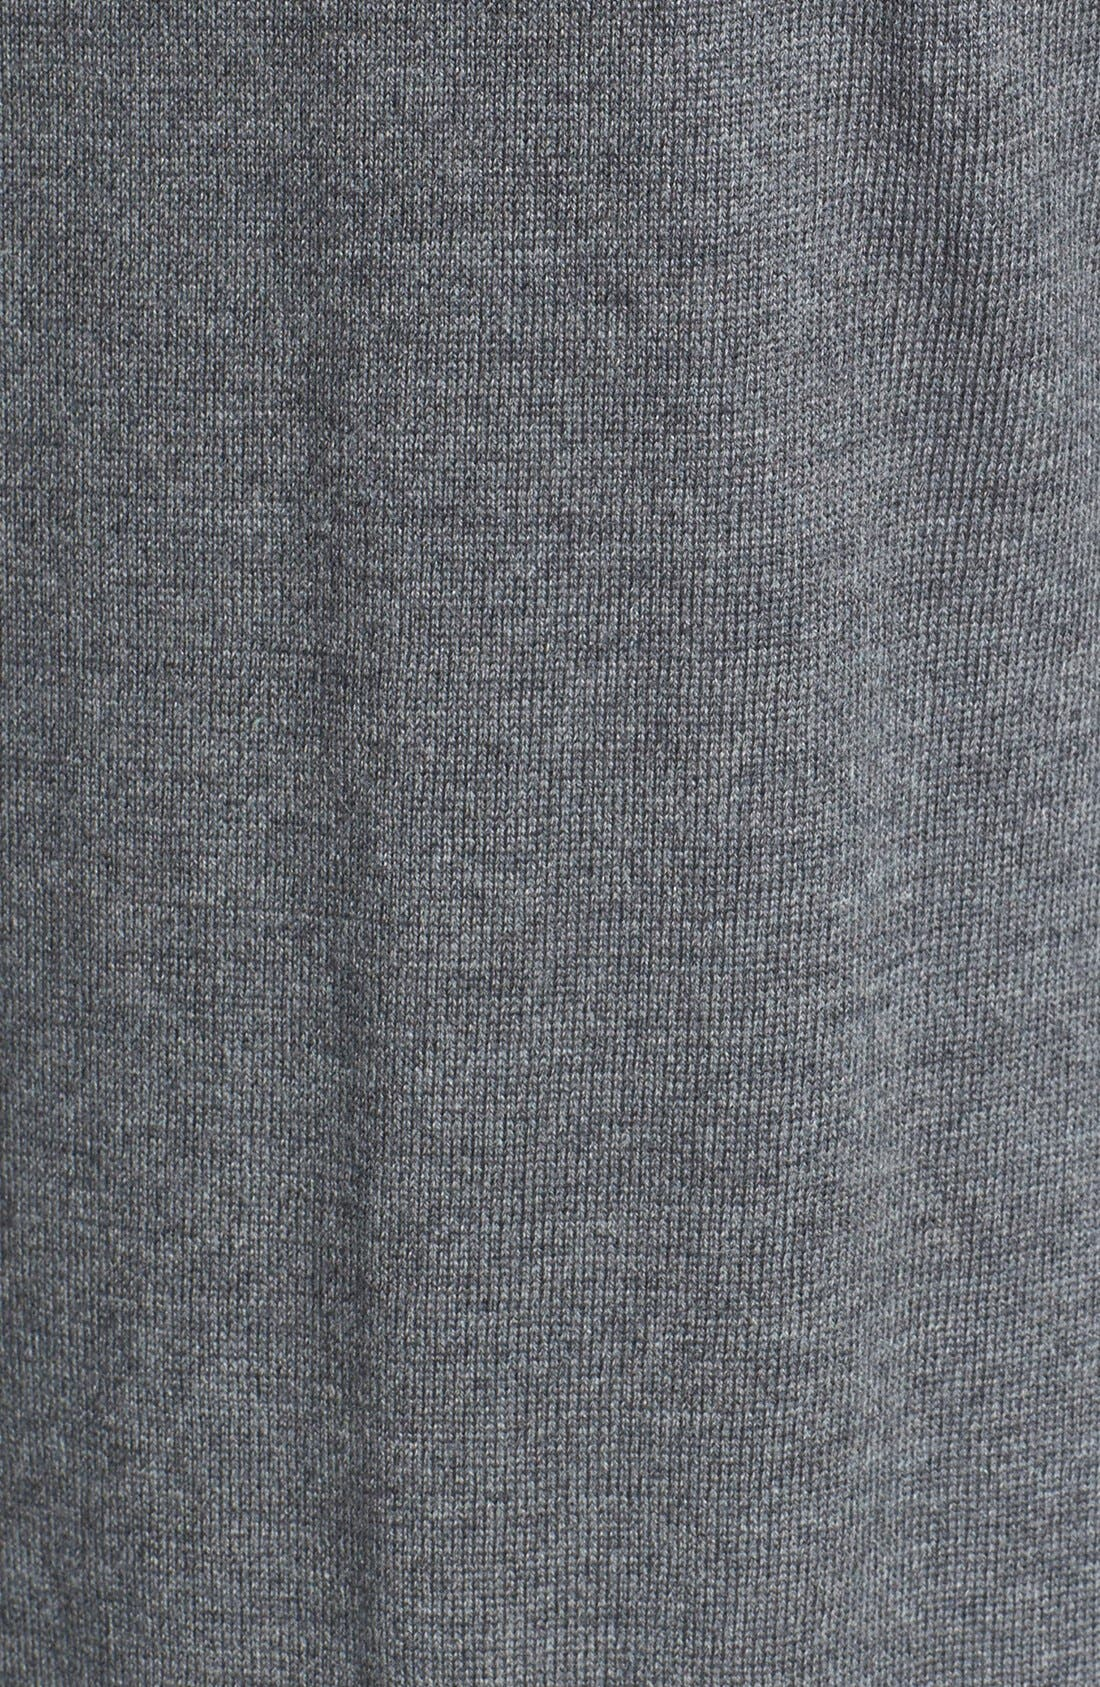 Alternate Image 3  - Eileen Fisher Raglan Sleeve Merino Wool Cardigan (Regular & Petite)